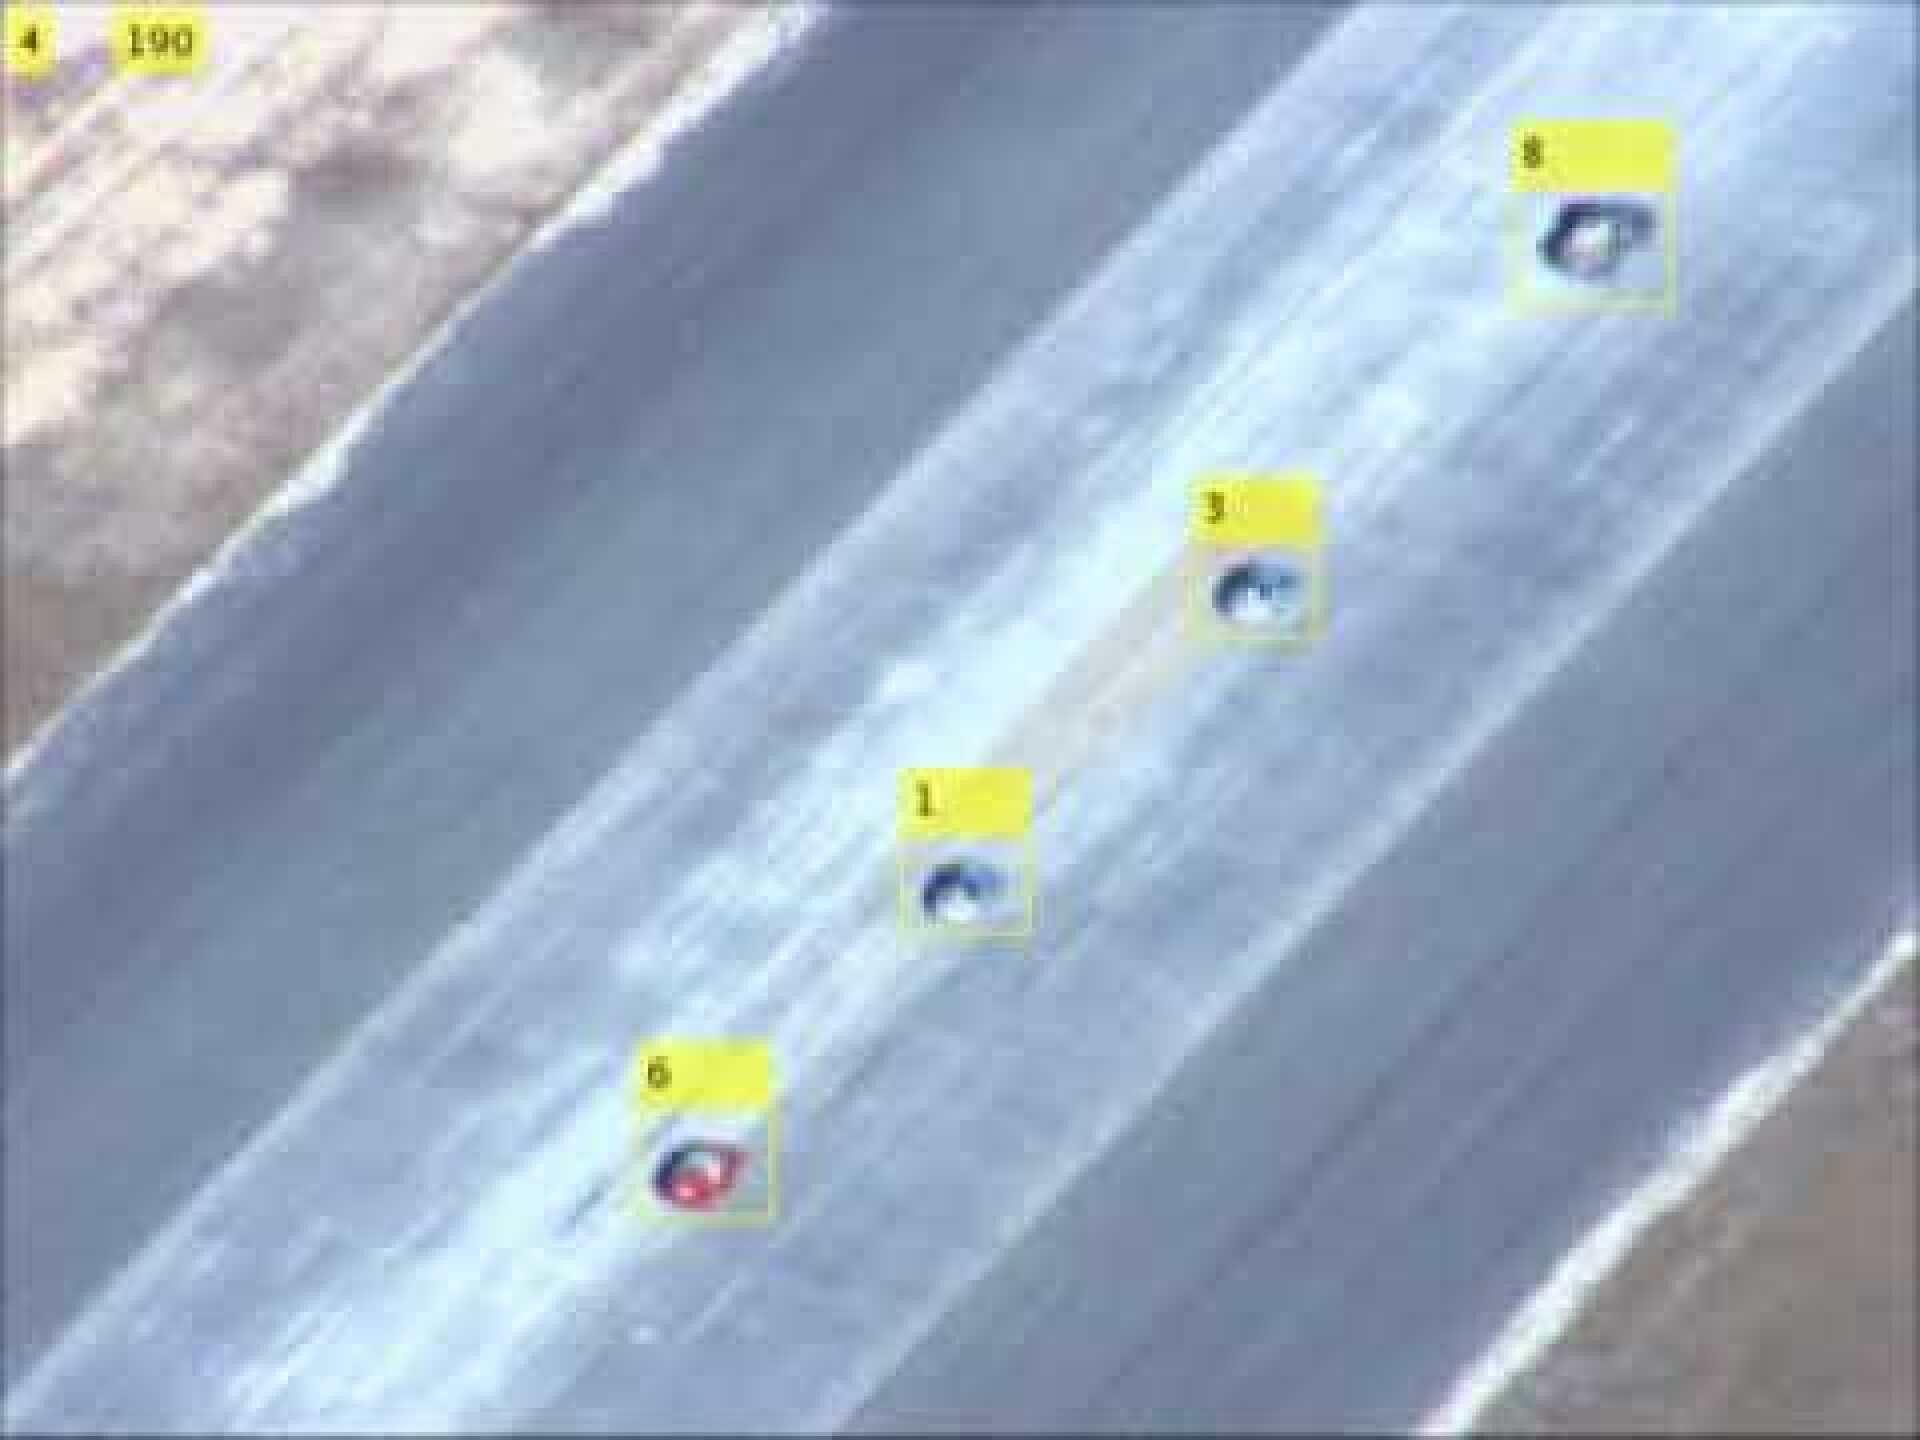 UAV Target Tracking